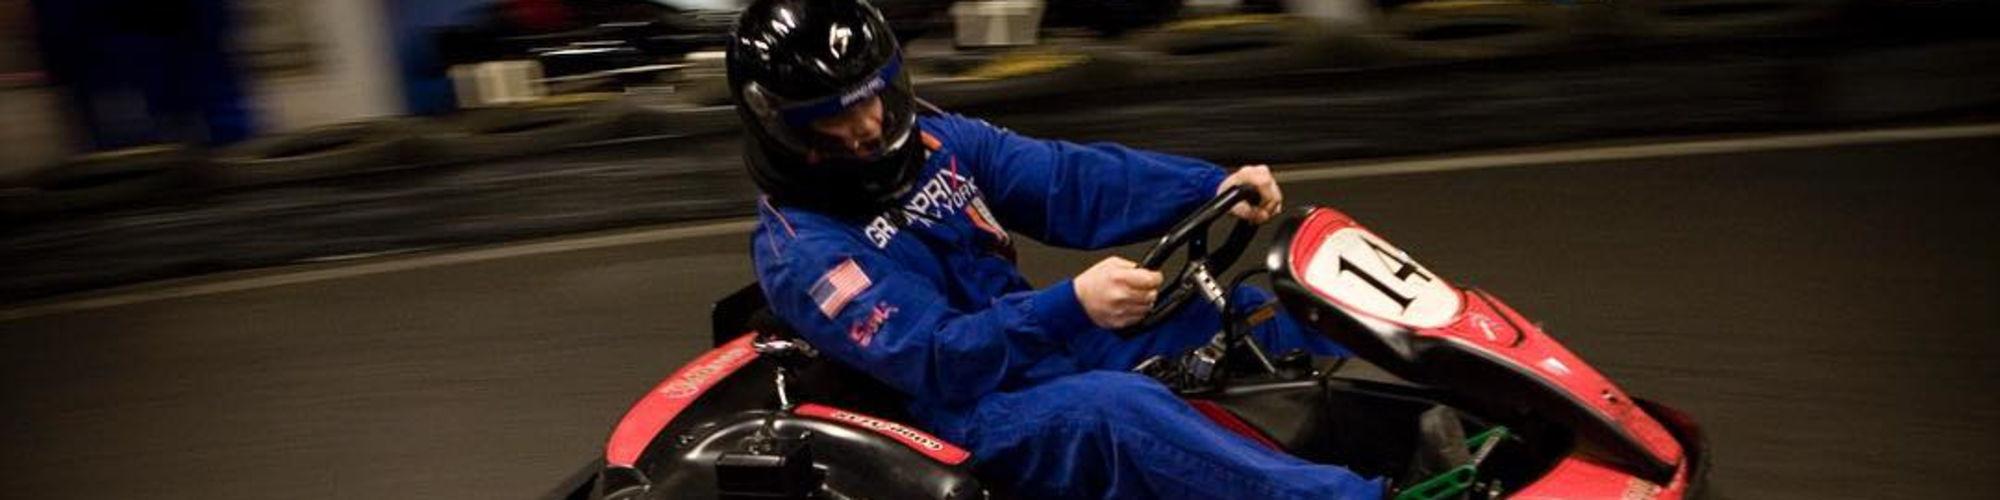 Grand Prix New York Racing cover image